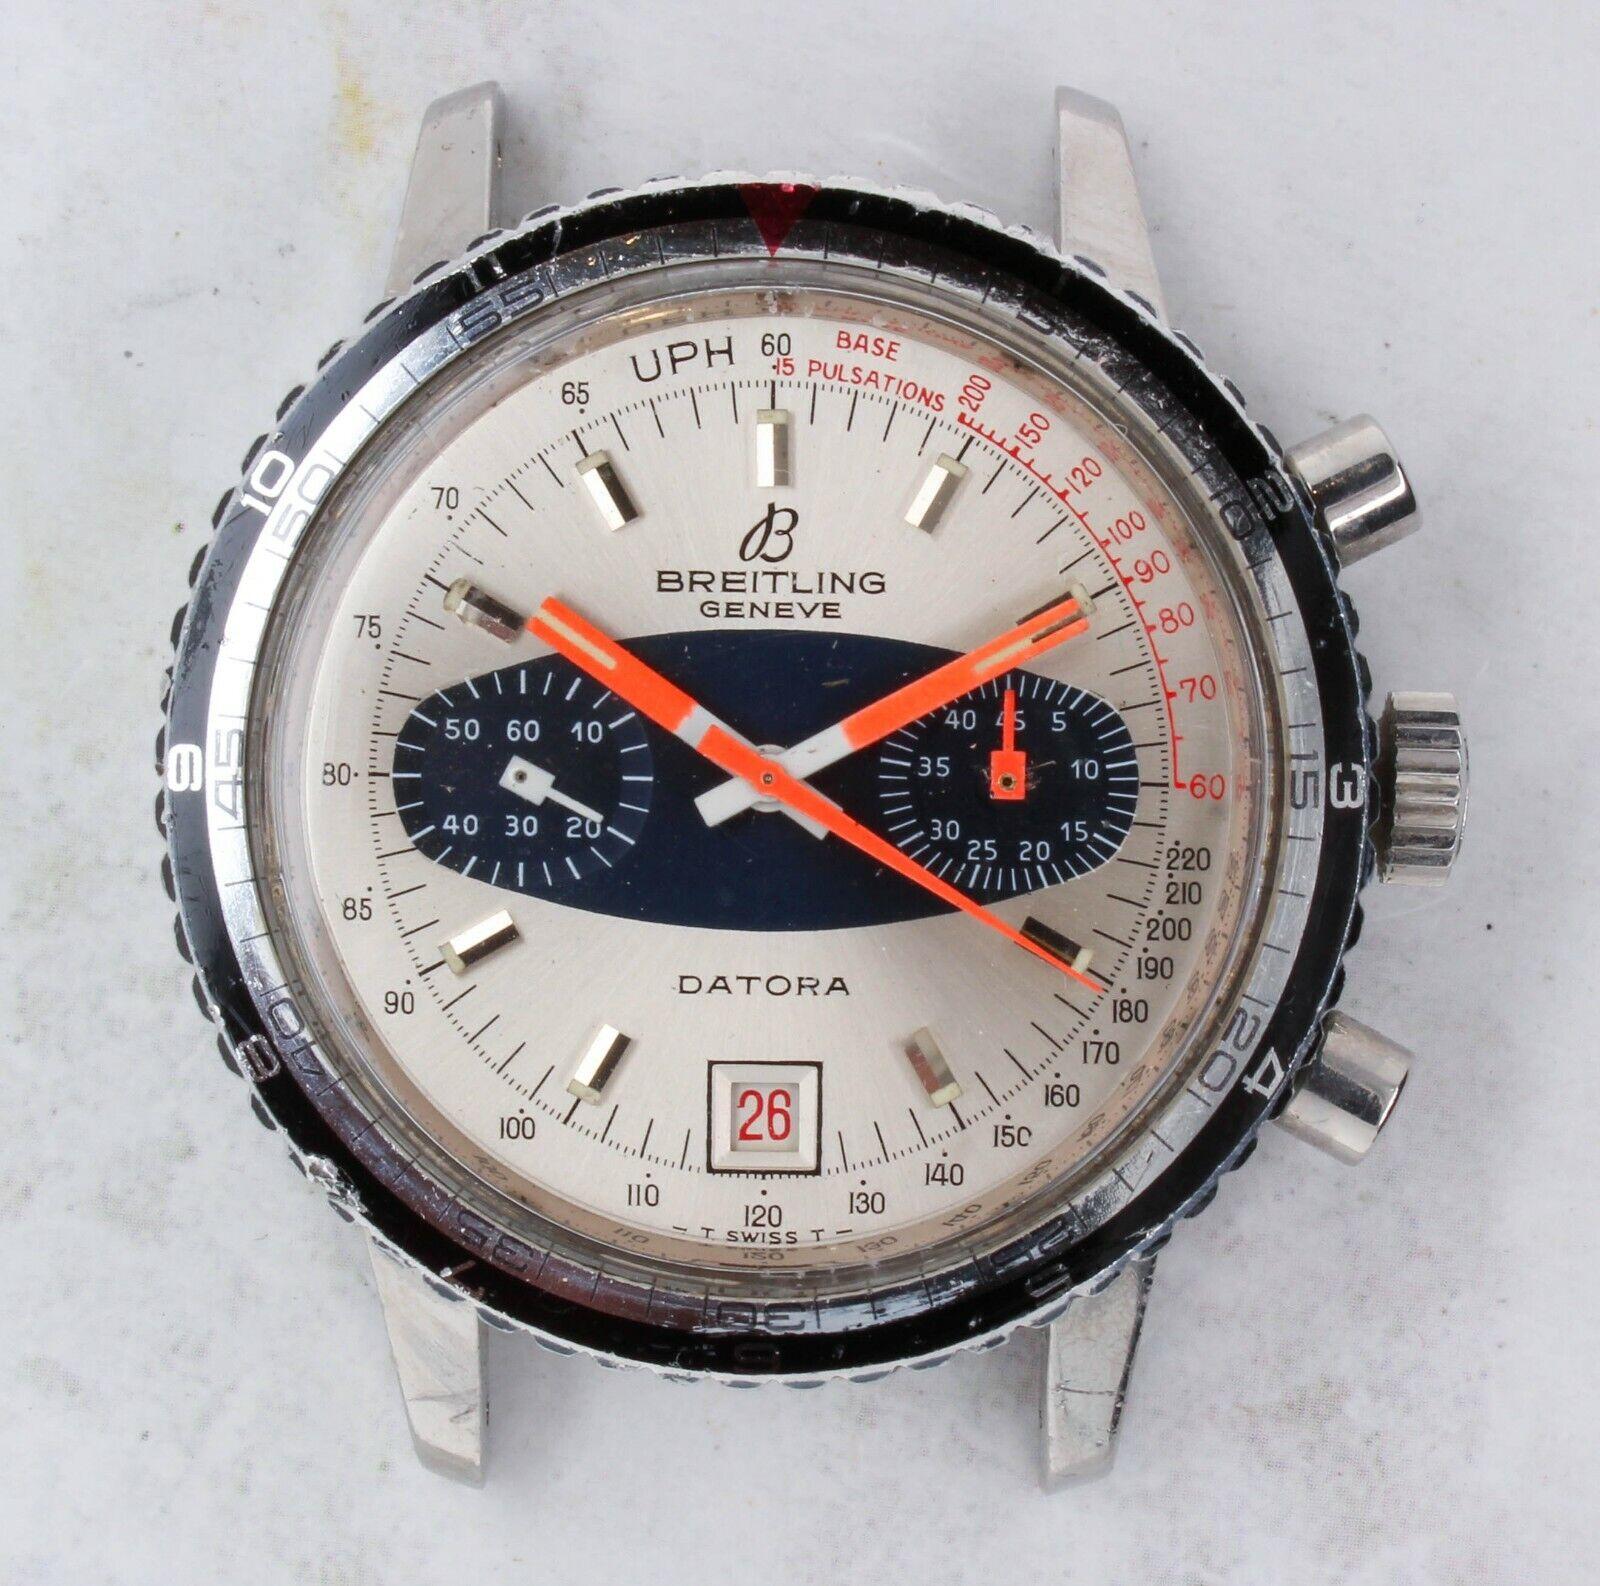 Vintage Breitling Datora Chronograph Wristwatch Ref. 2031 Valjoux 7734 RARE NR - watch picture 1